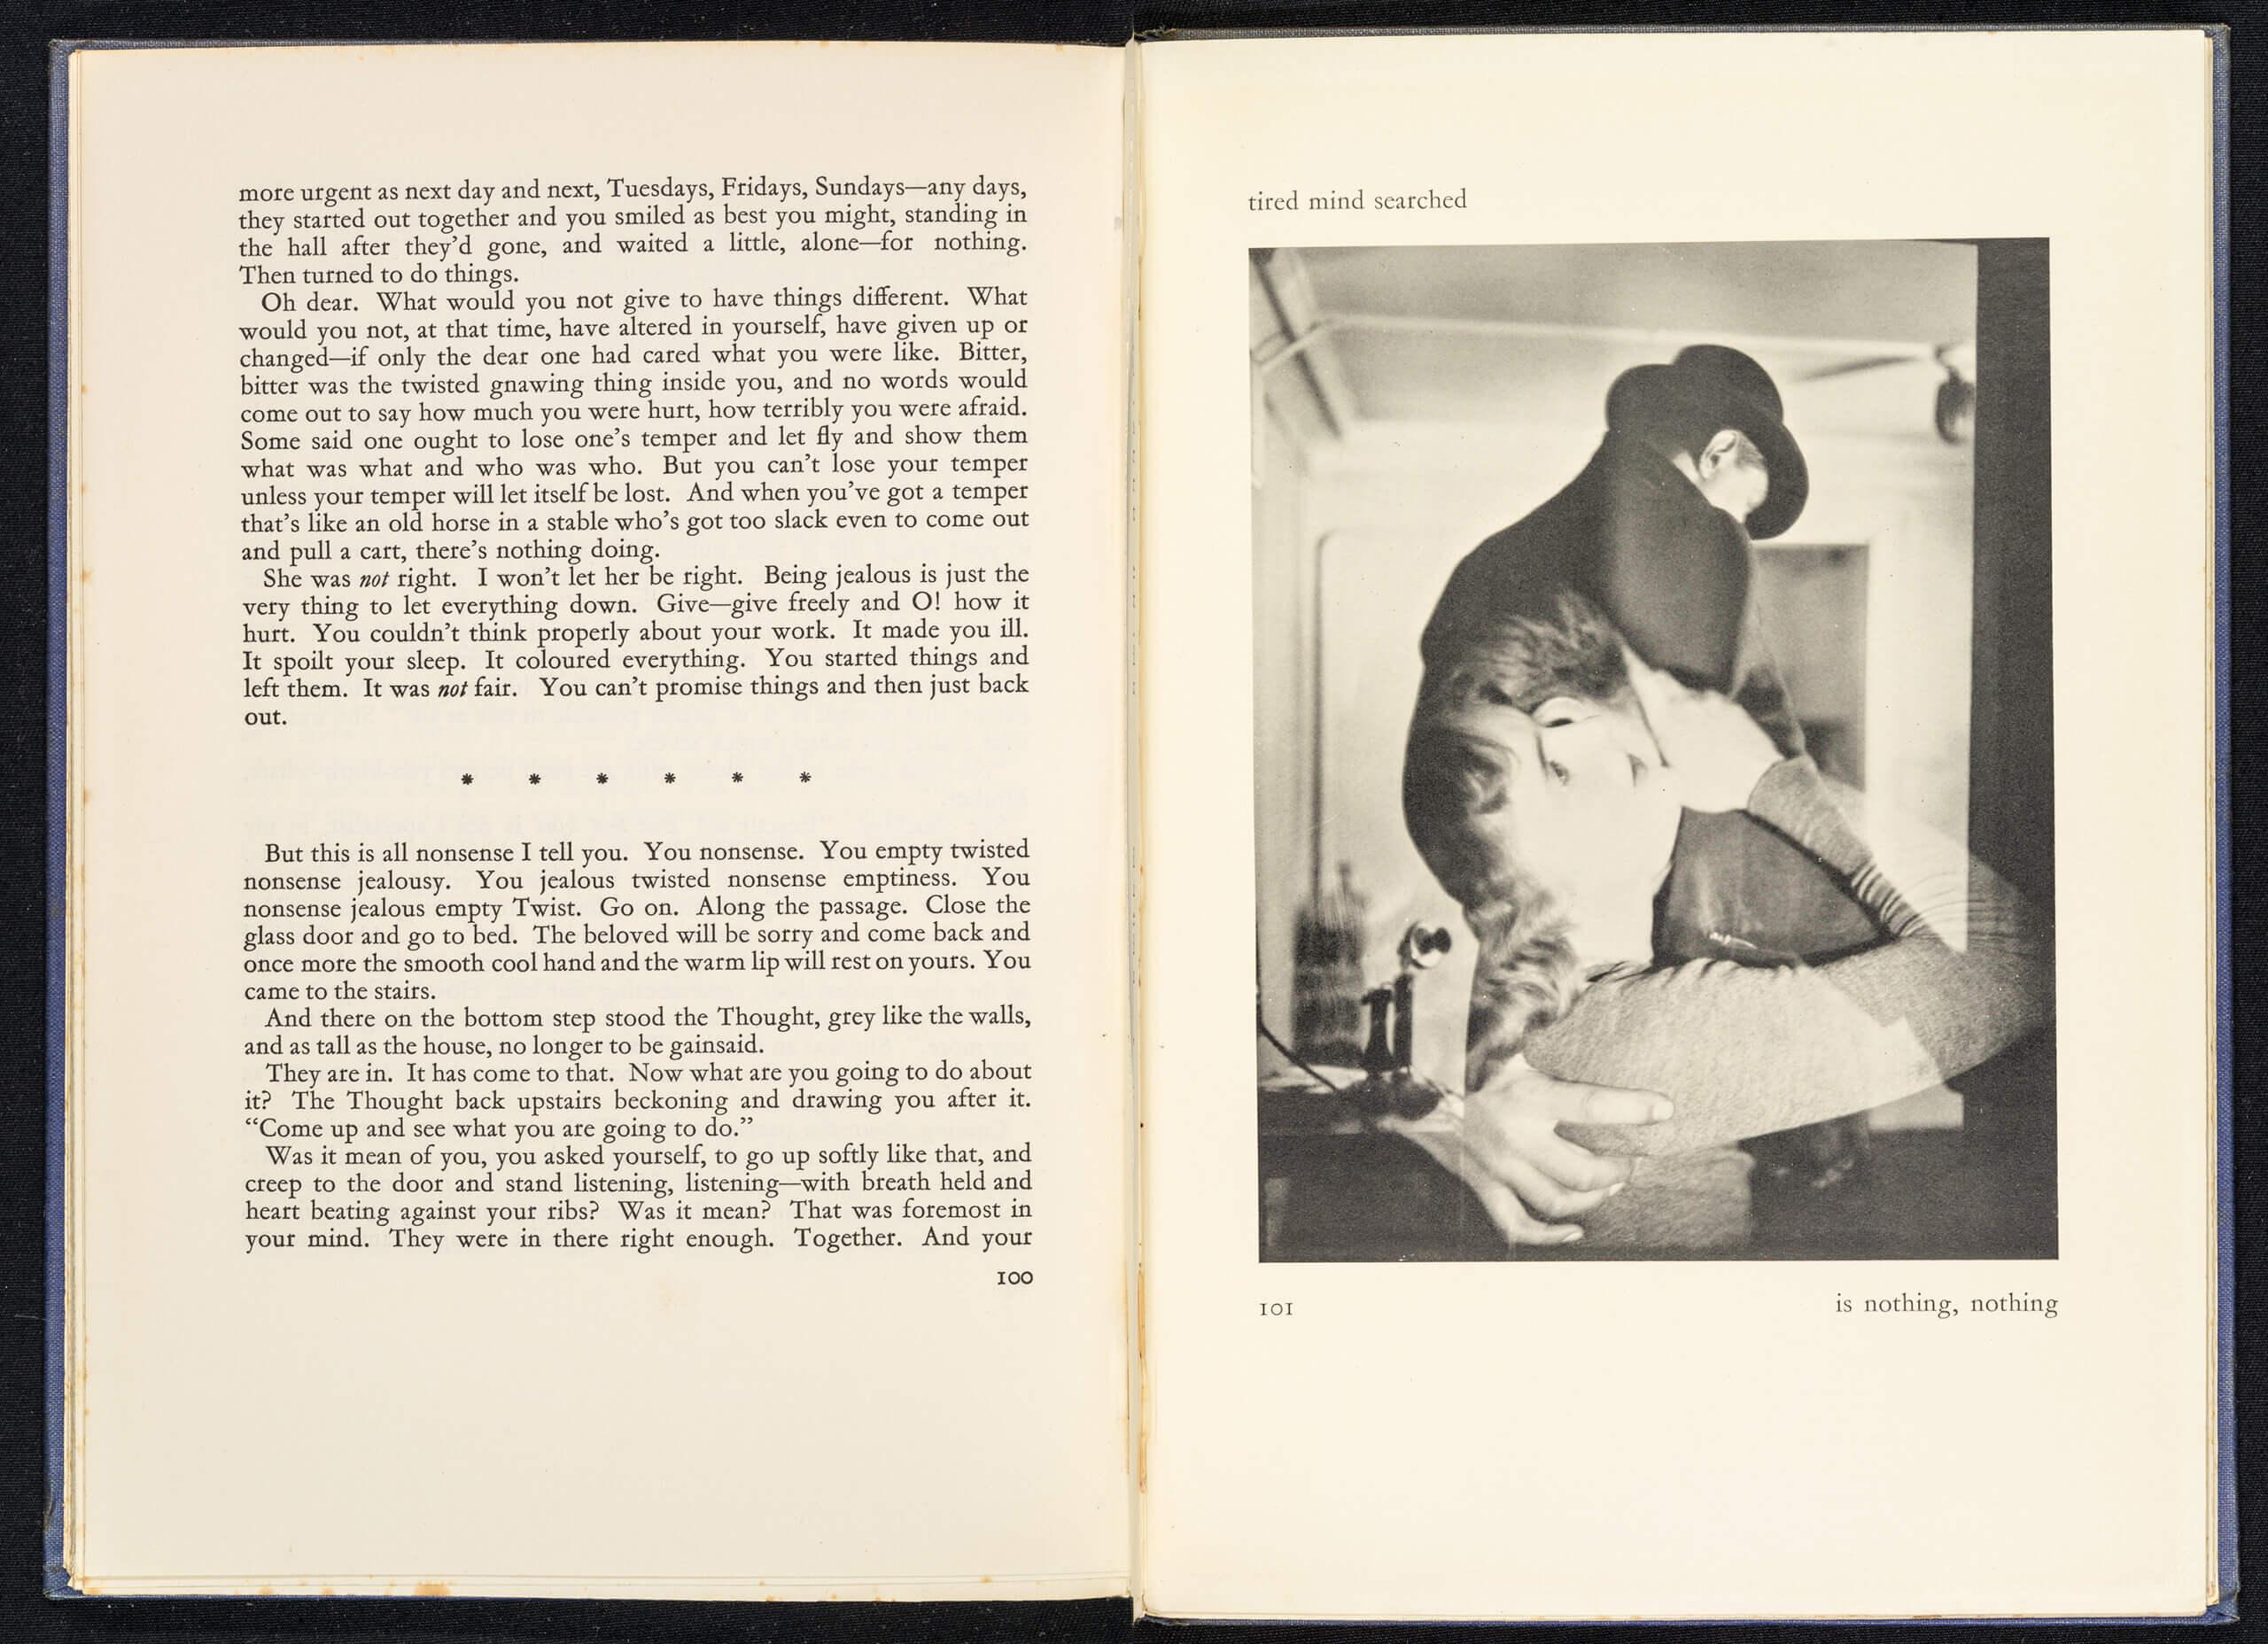 Lance Sieveking et Francis Bruguiere, <em>Beyond This Point</em>, Duckworth, Londres, 1929. Courtesy University of St Andrews Library, Écosse & Nick Sieveking.